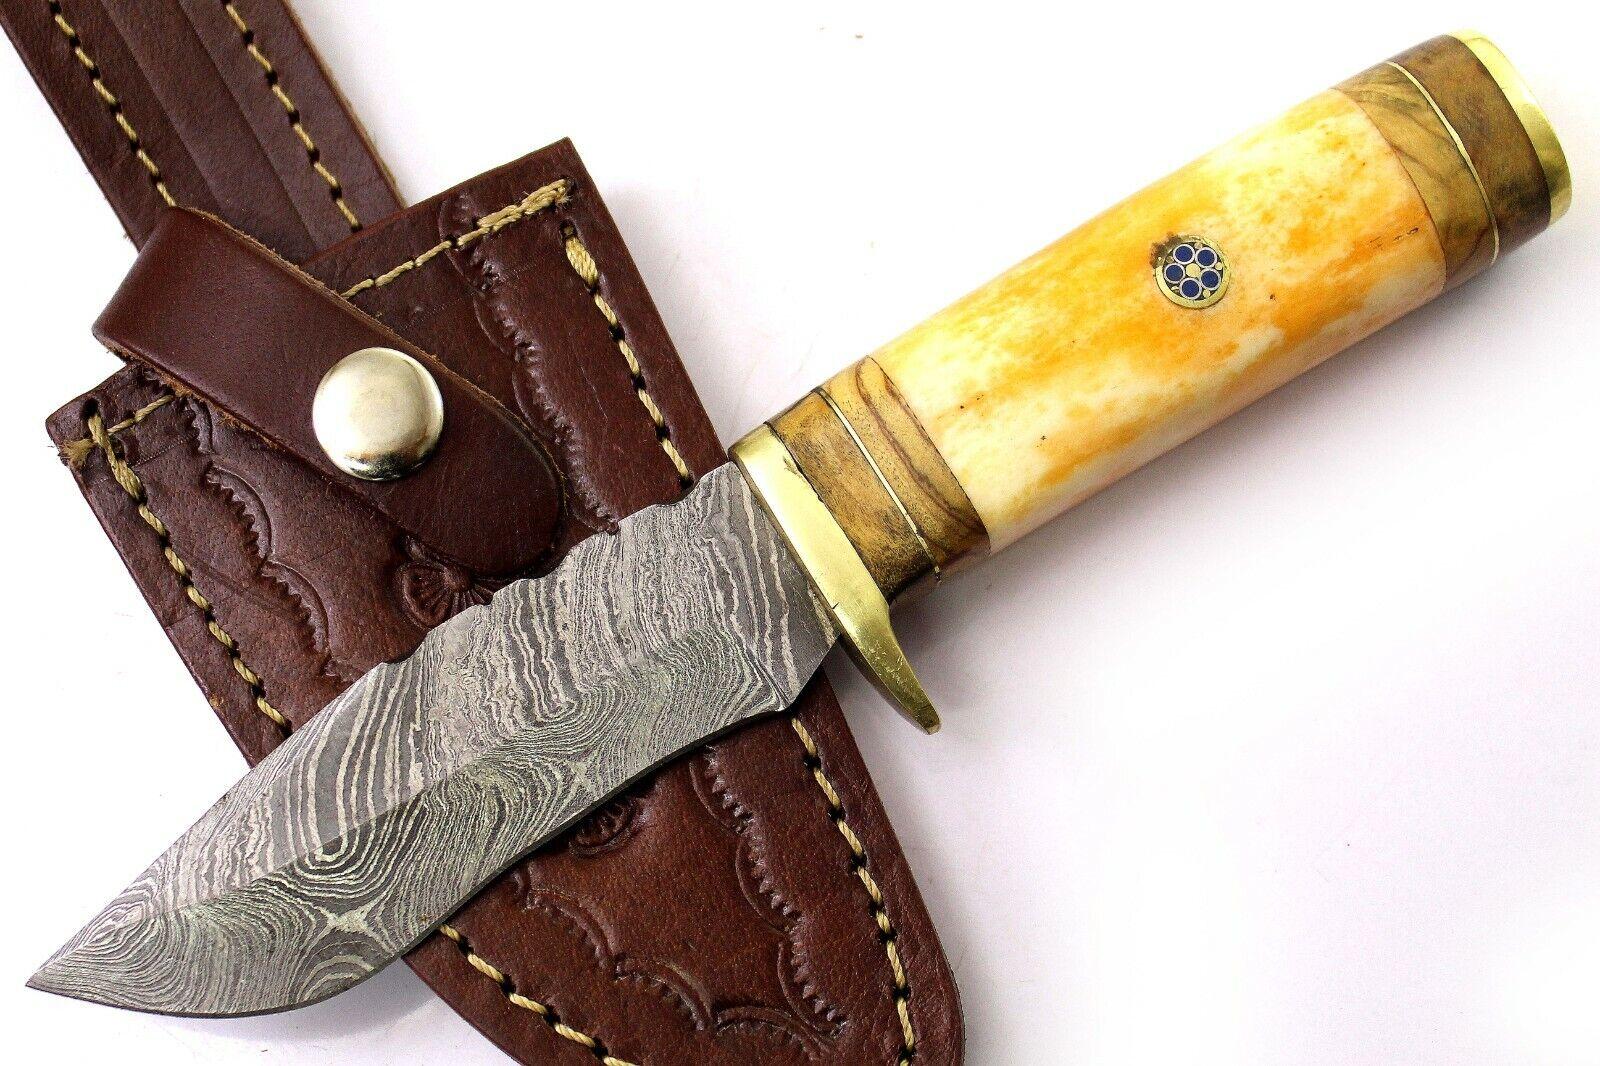 8 Handmade Damascus Knife-Tinted Farming Bone And Wood Handle-US-463 - $14.47